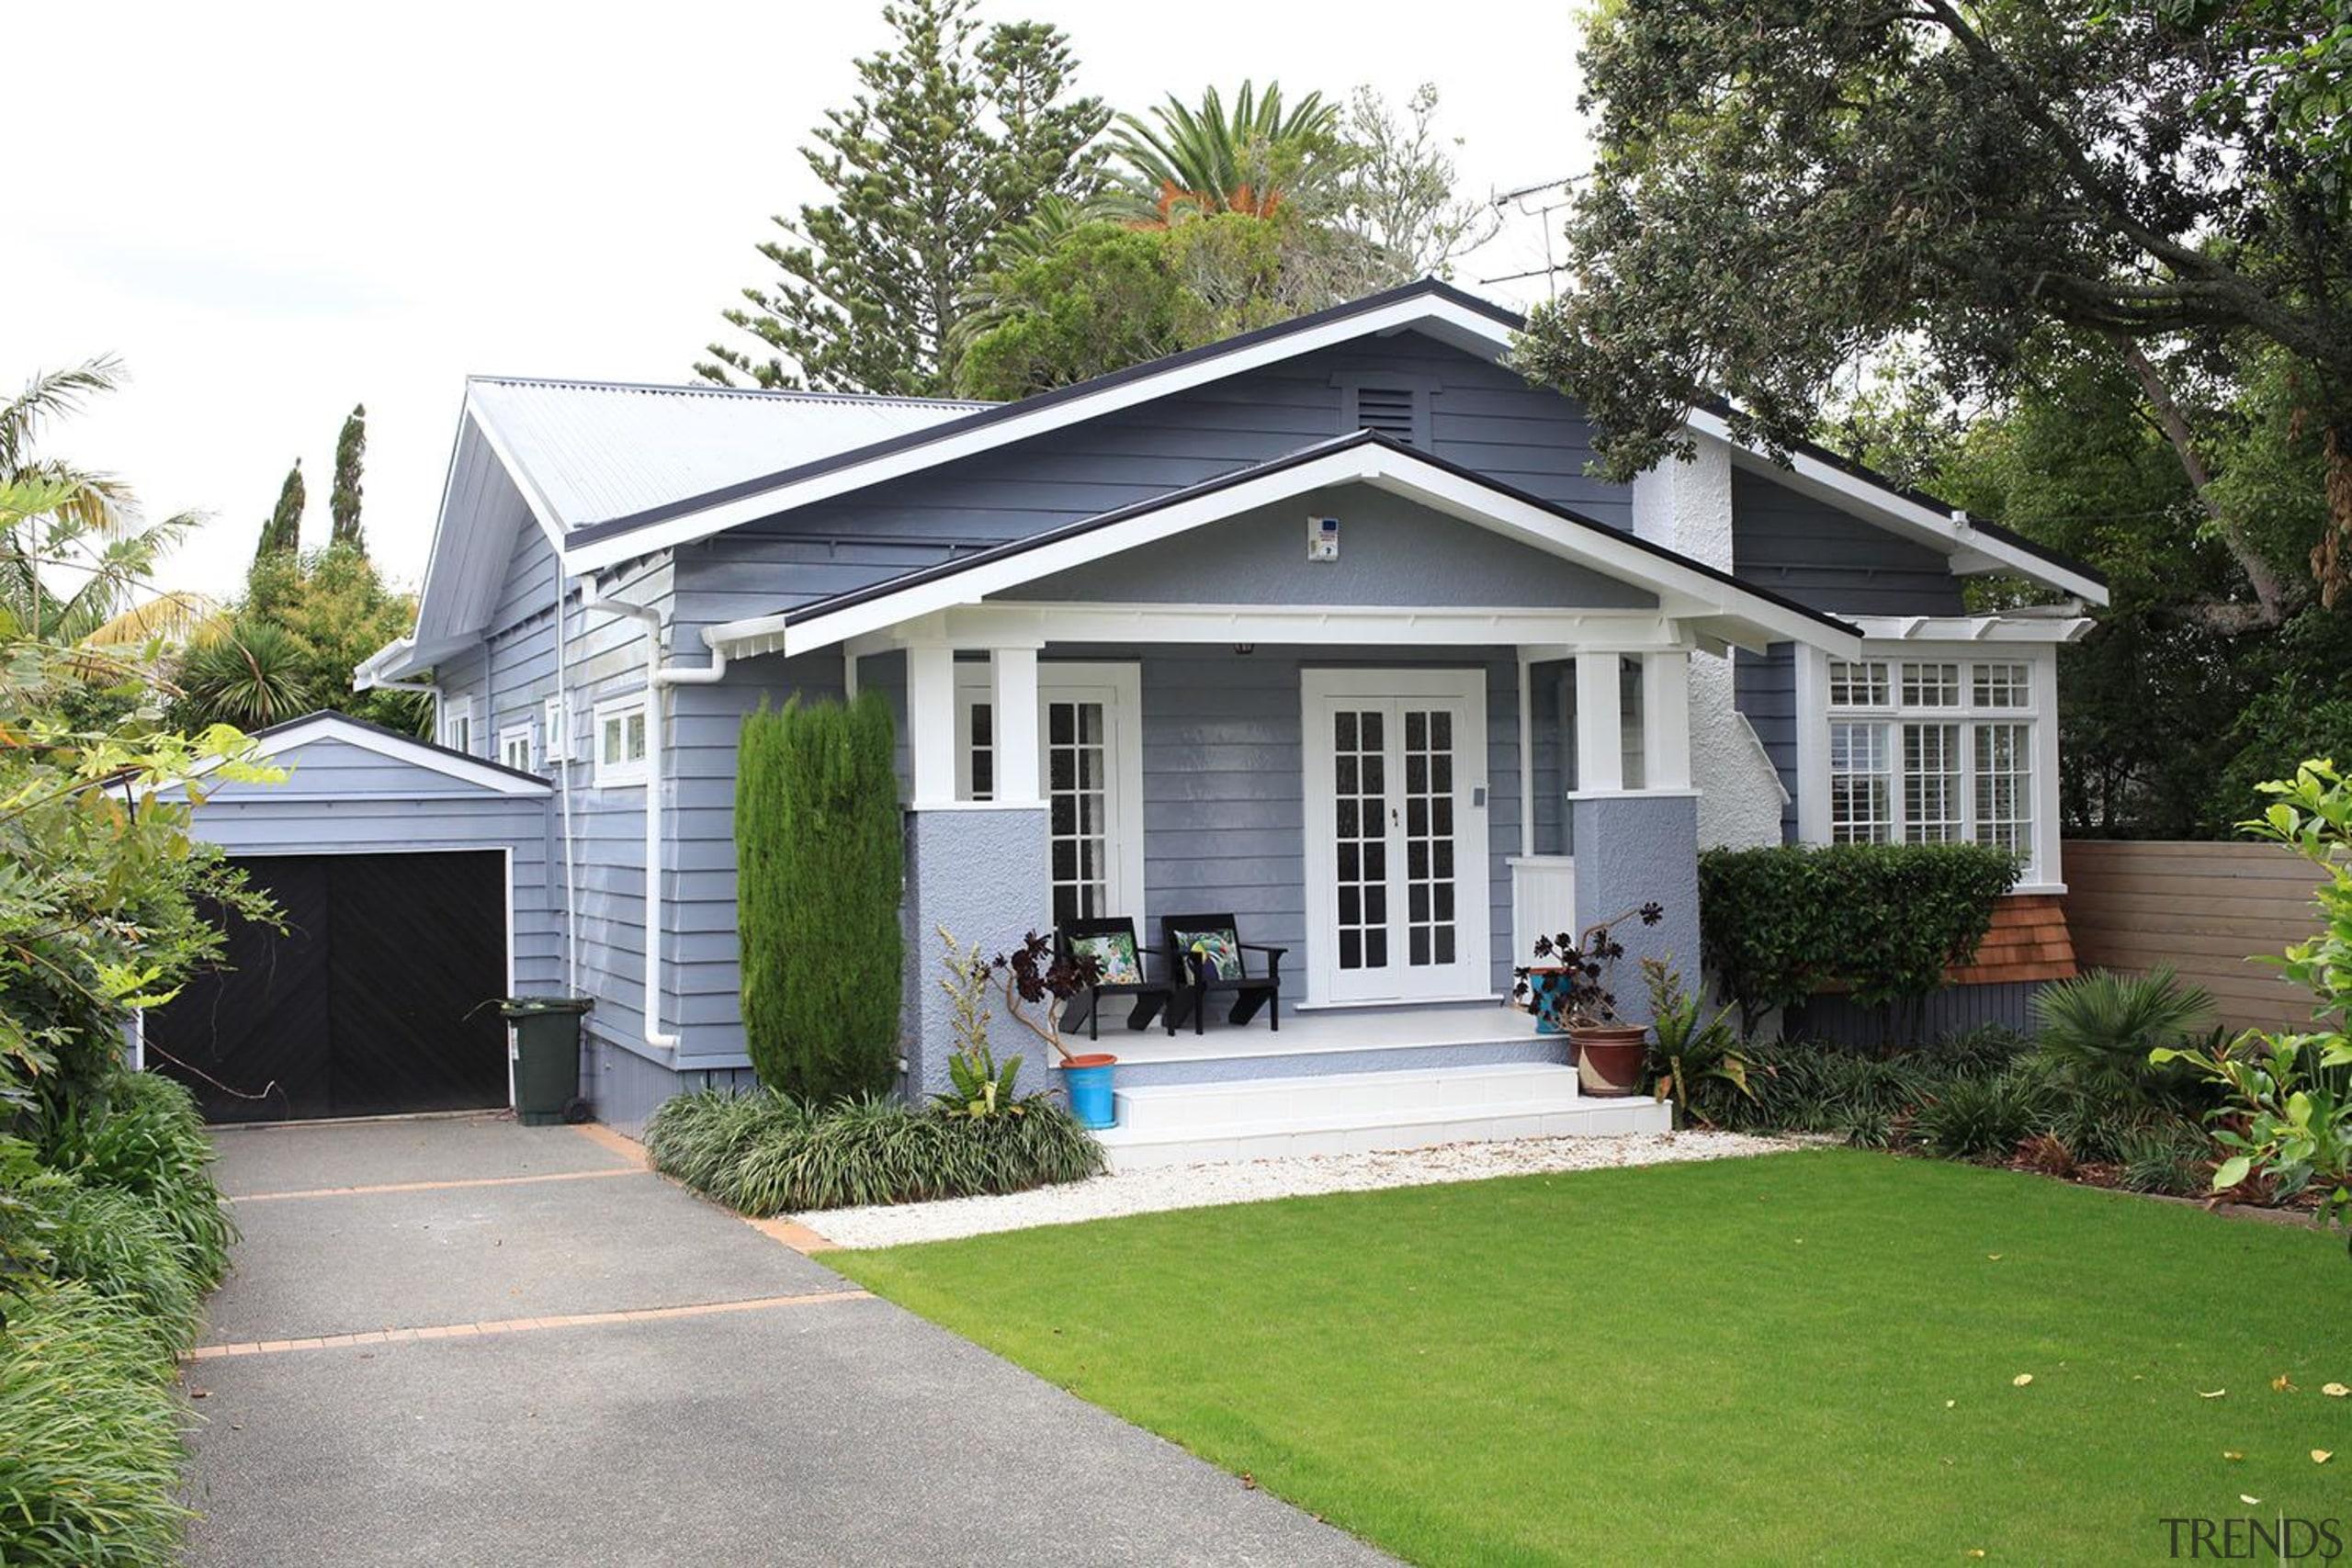 12 Hb0917 Front Horizontal - cottage   estate cottage, estate, facade, farmhouse, home, house, property, real estate, residential area, siding, window, yard, white